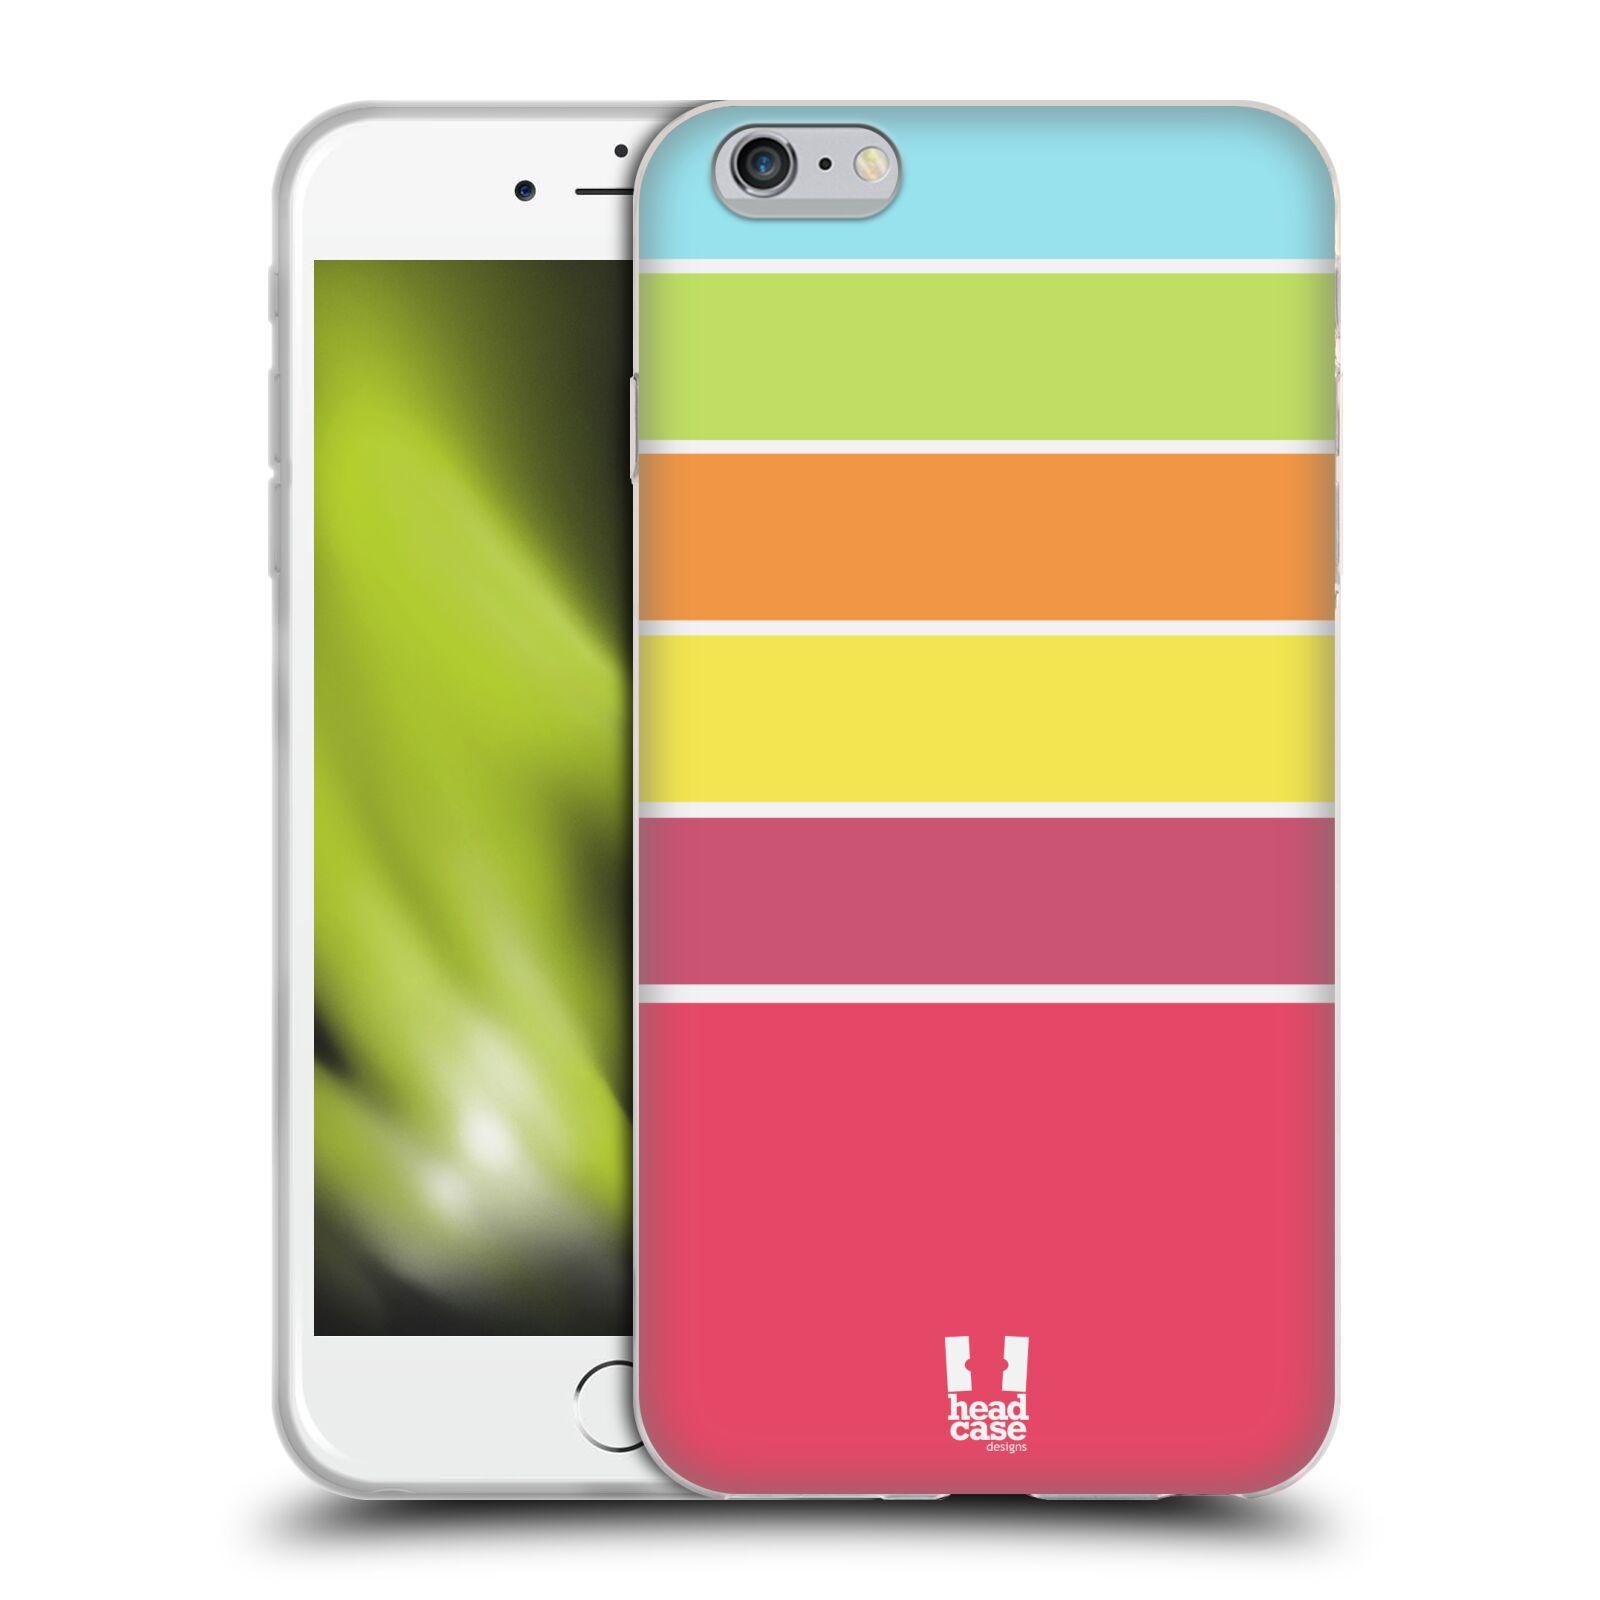 HEAD CASE silikonový obal na mobil Apple Iphone 6 PLUS/ 6S PLUS vzor Barevné proužky RŮŽOVÁ, ORANŽOVÁ, ZELENÁ